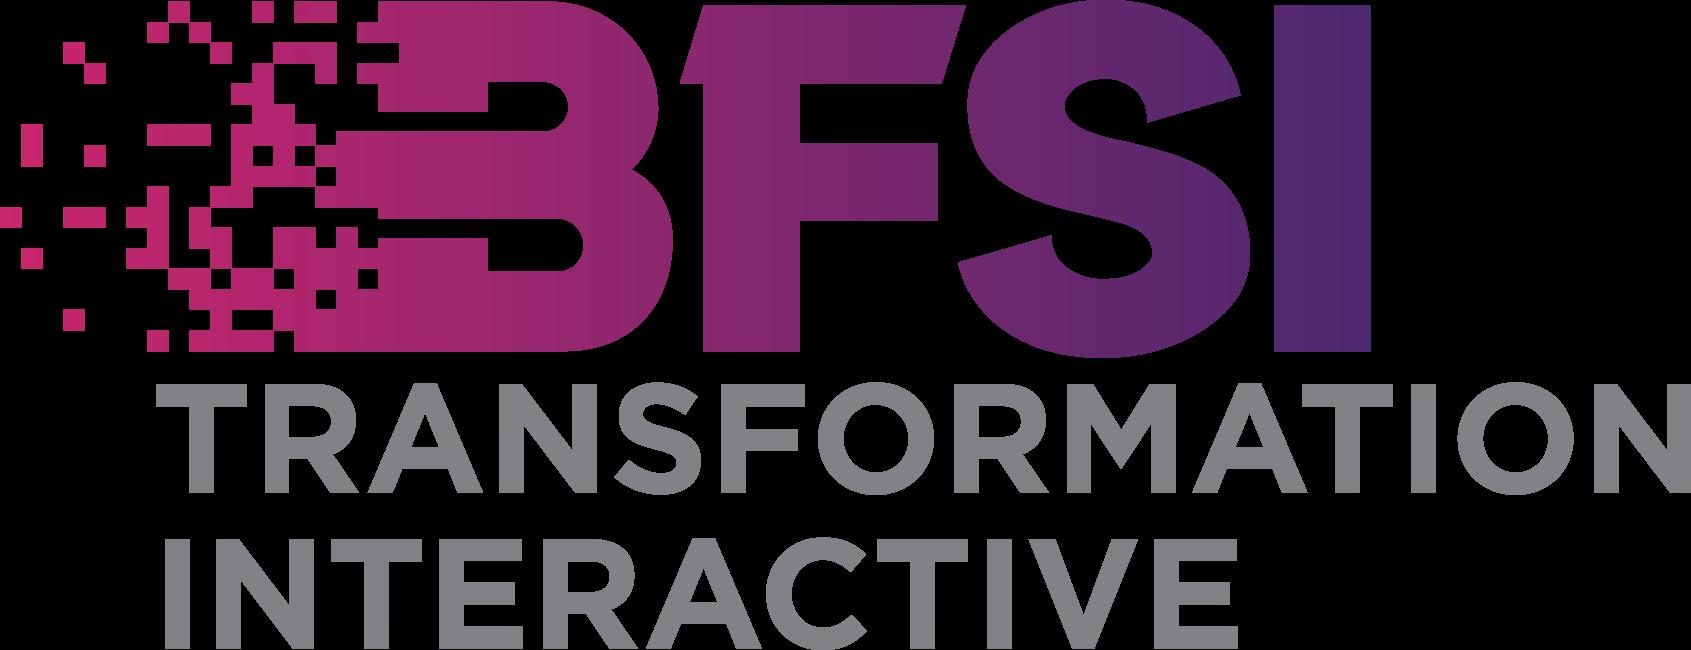 BFSI Transformation Interactive